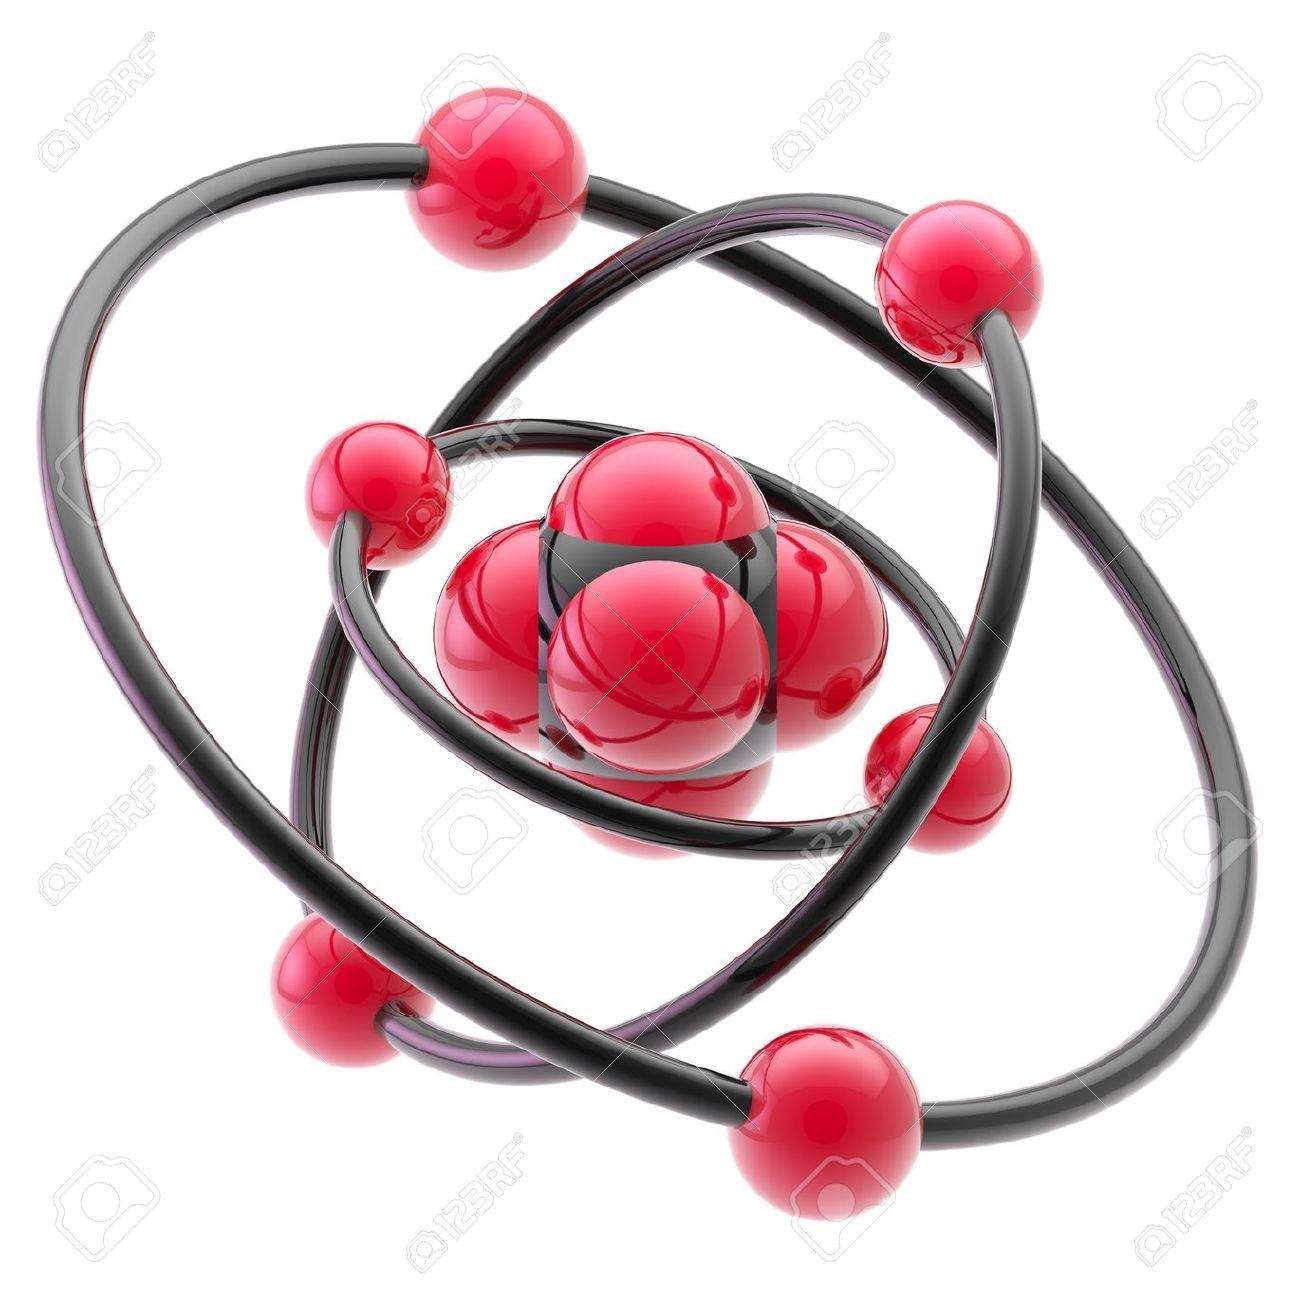 Nano technology emblem as atomic structure Stock Photo - 13145352